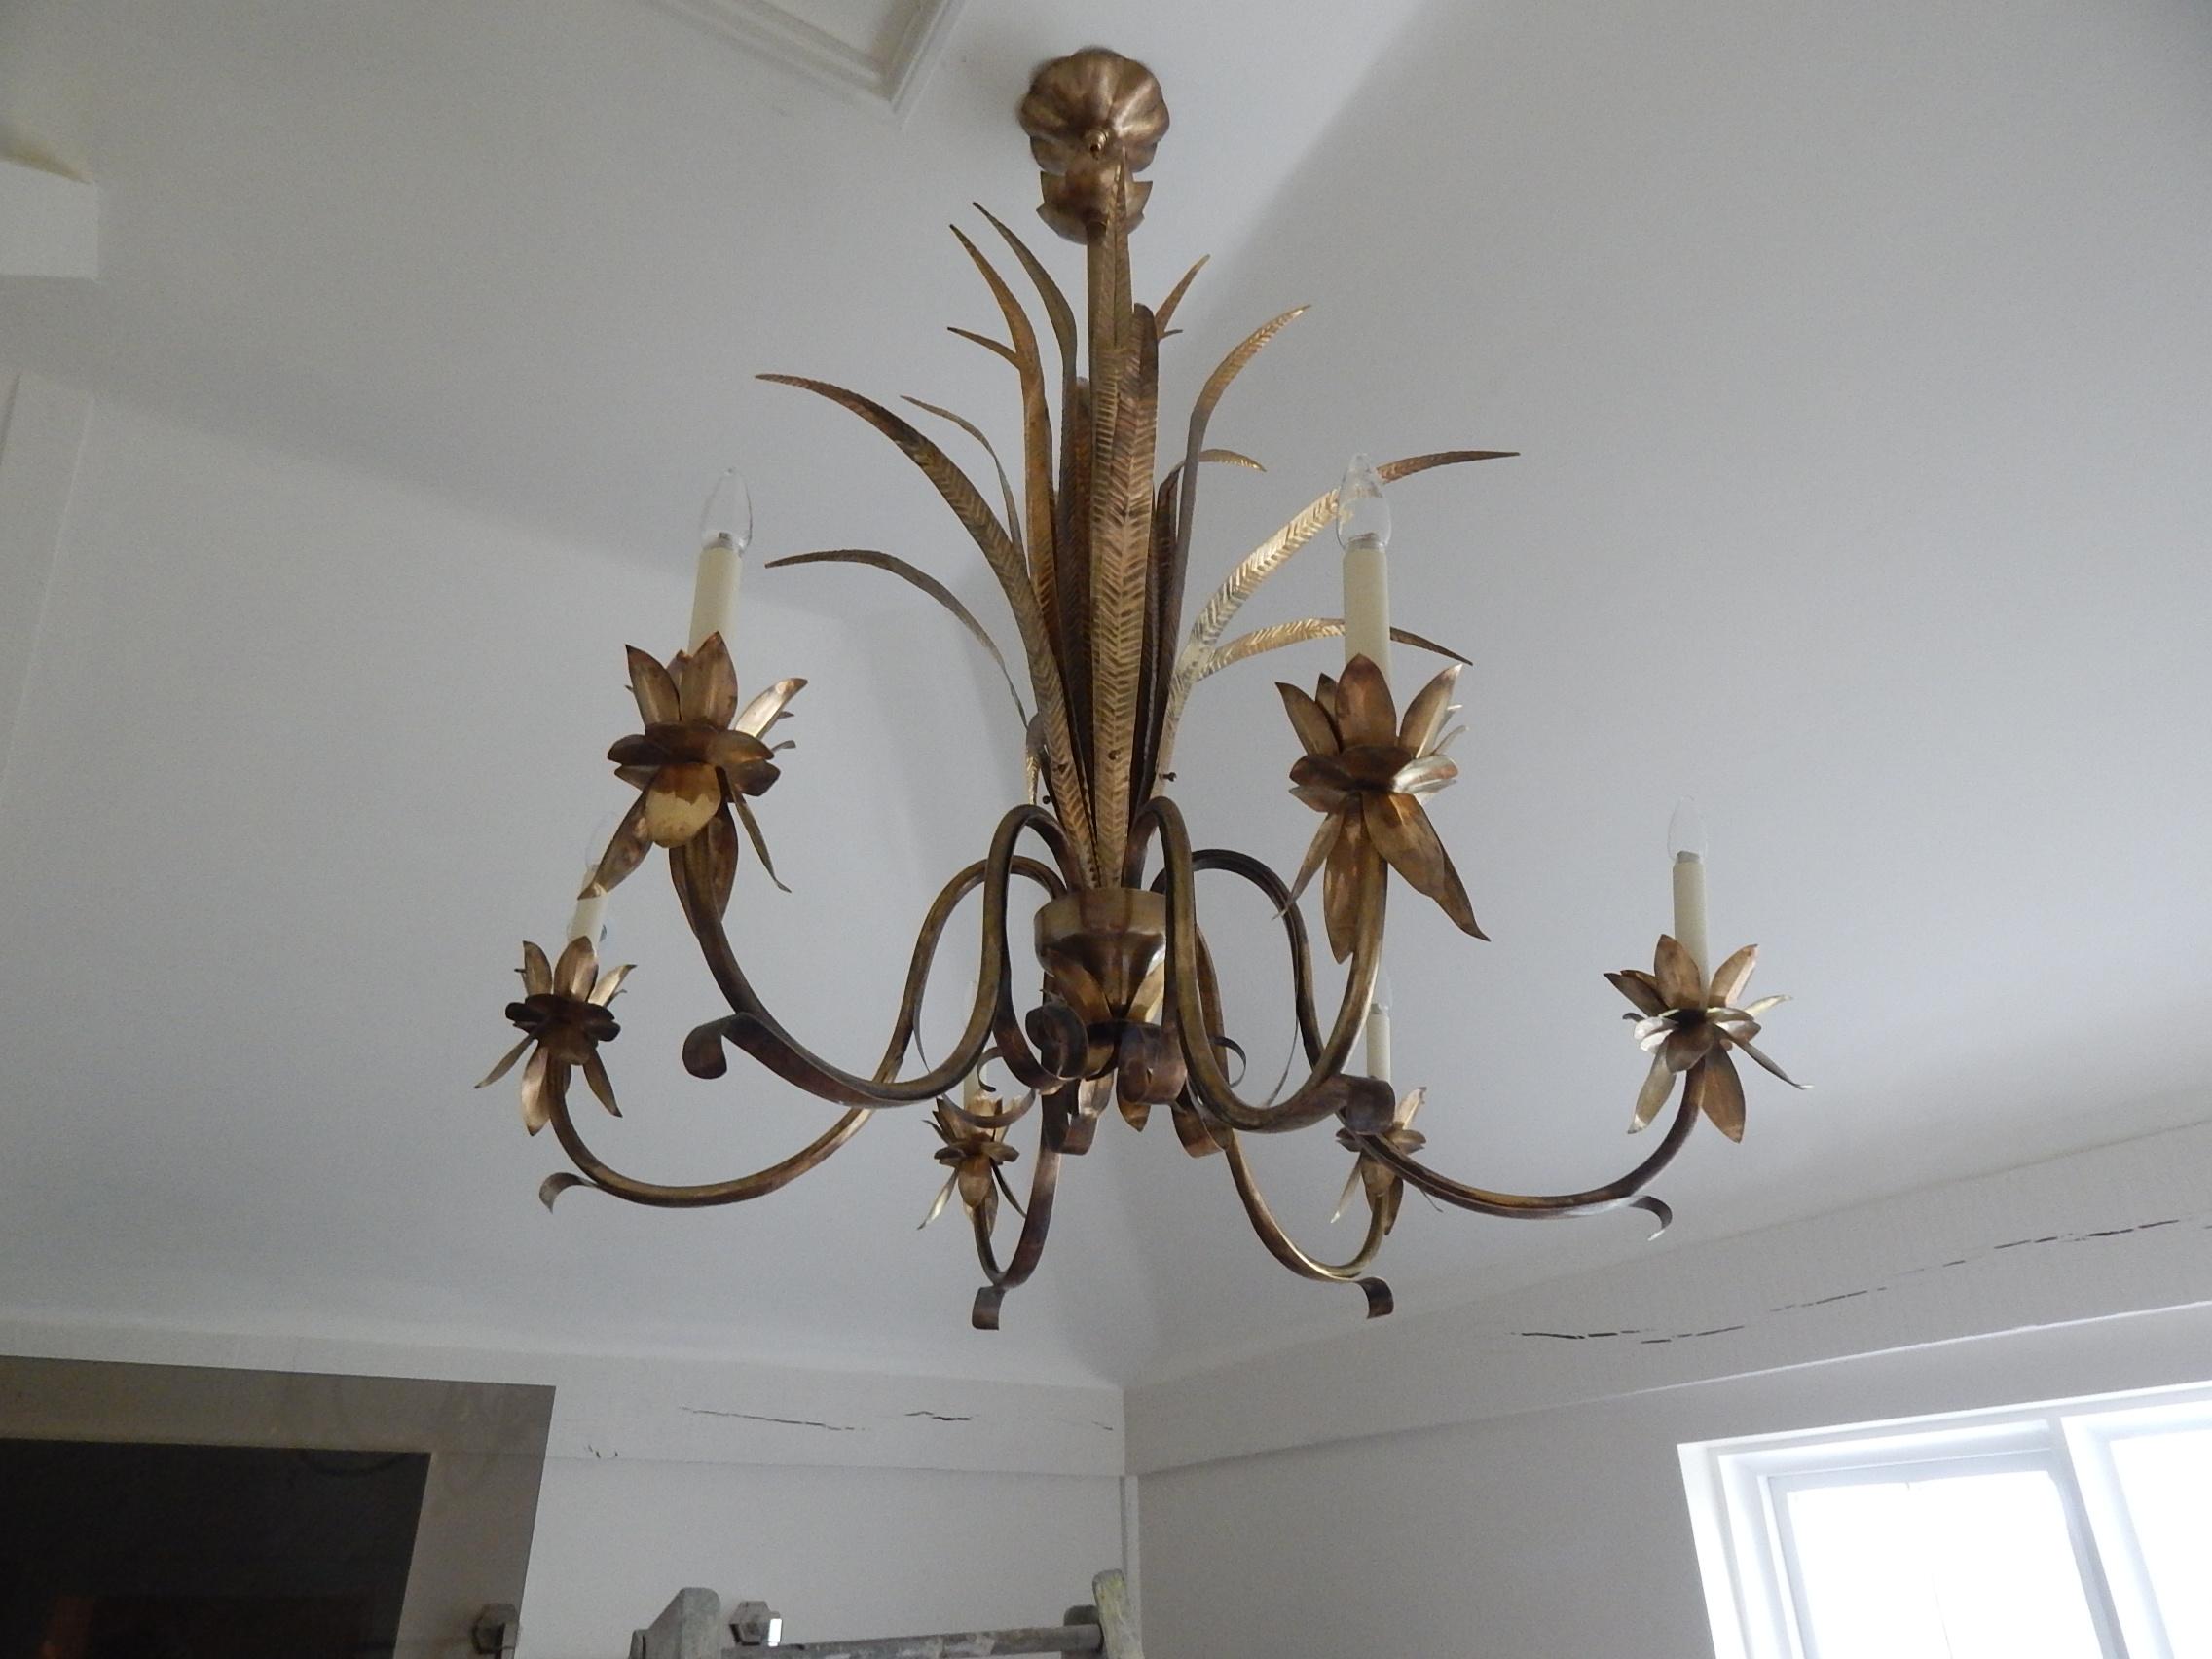 lighting lights blissful bliss wicker corners light fixture bedroom pendant pin